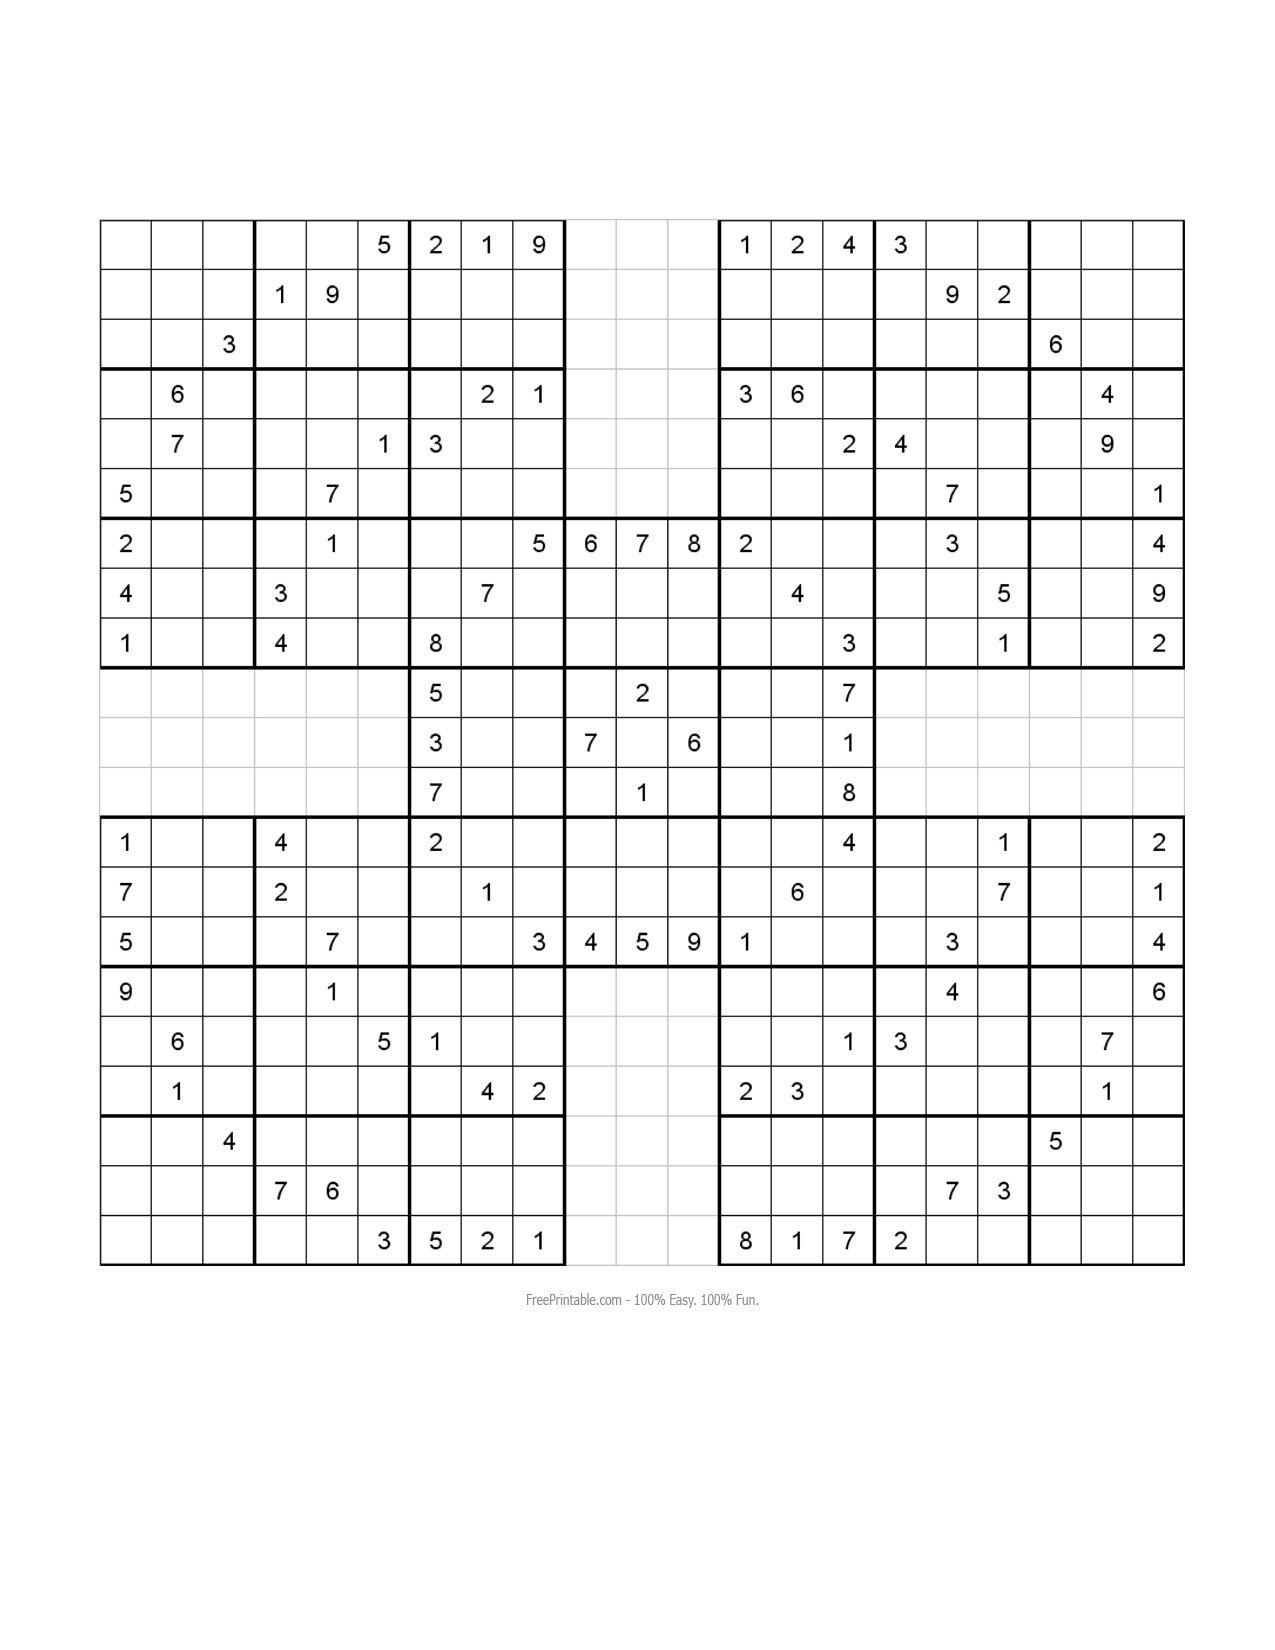 Free Printable Samurai Sudoku Puzzles   Spellen   Spellen - Free Printable Samurai Sudoku